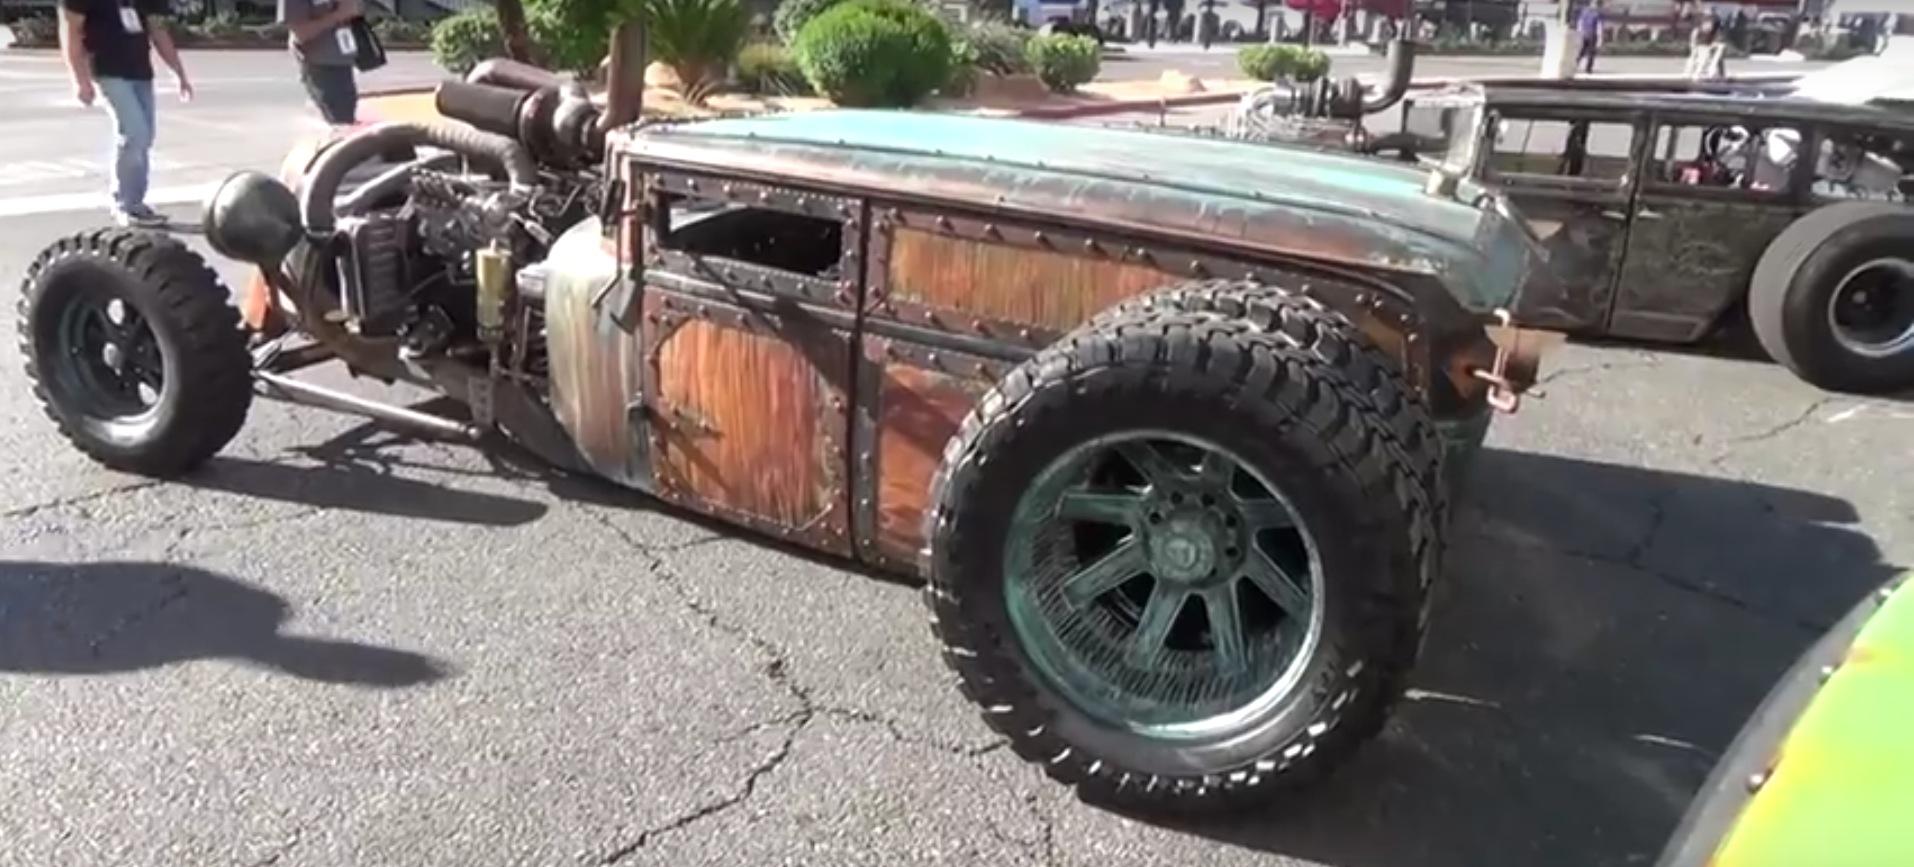 Rustcar.jpg